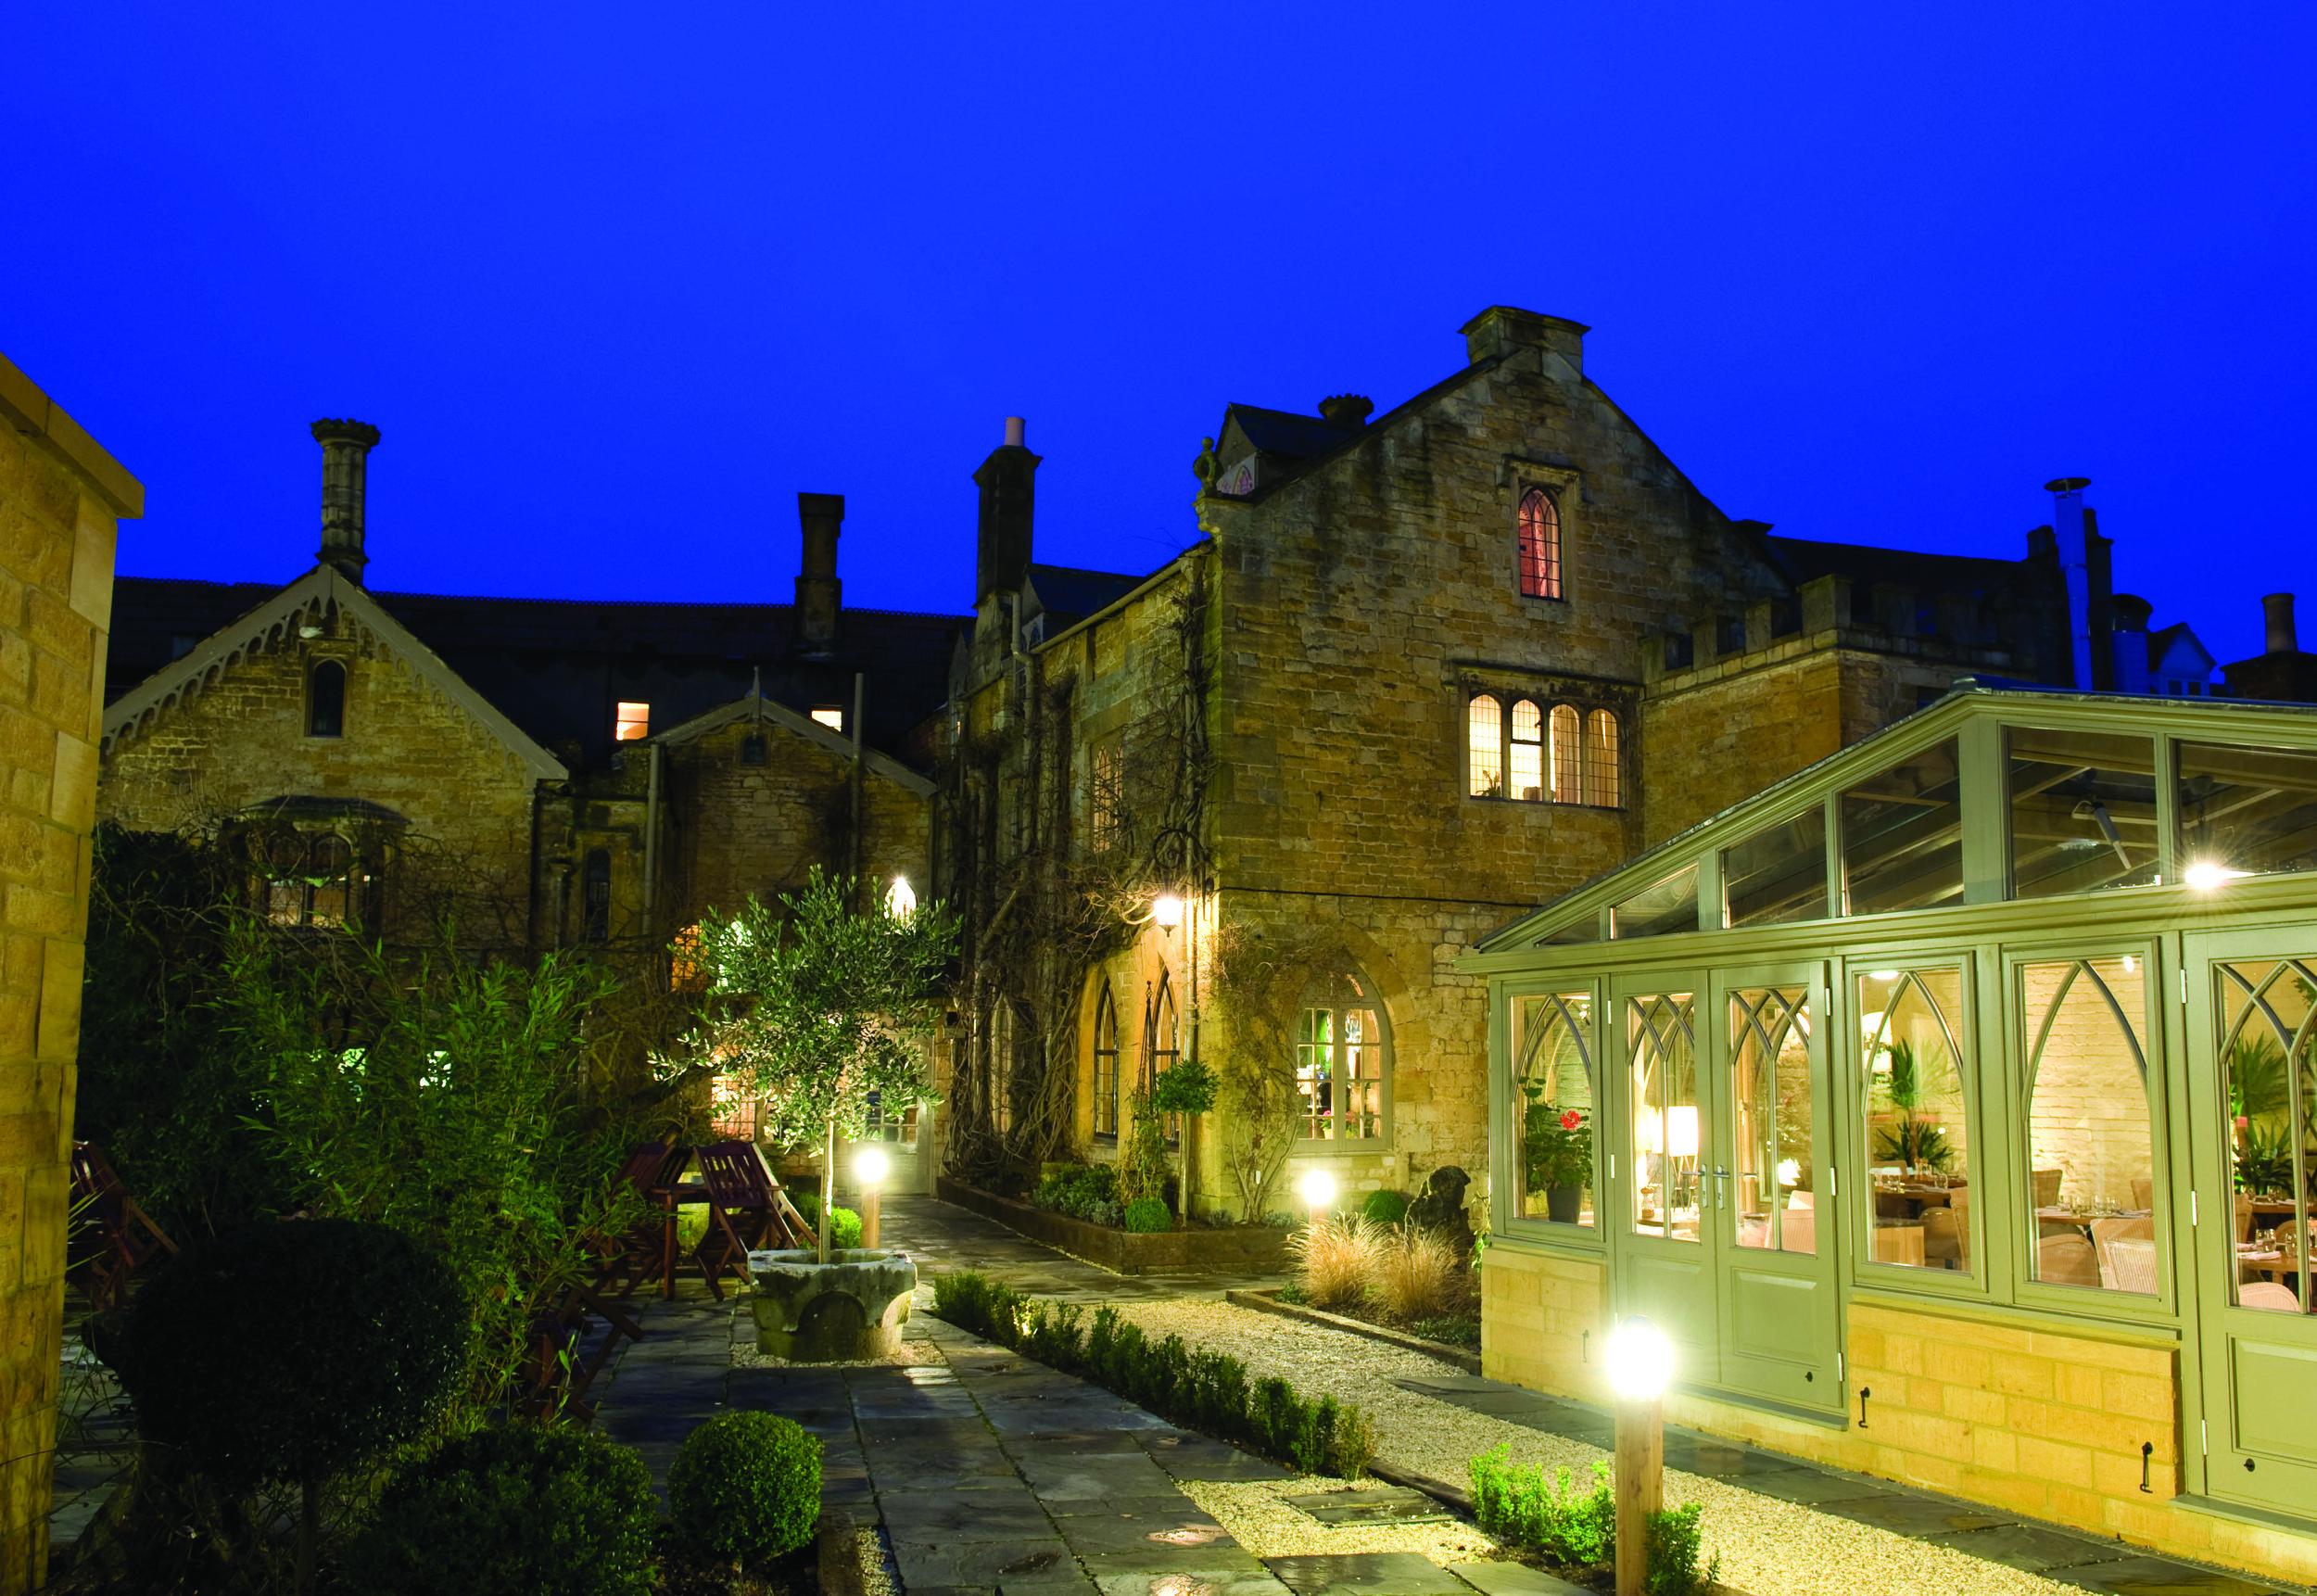 The Manor House - Moreton-in-Marsh